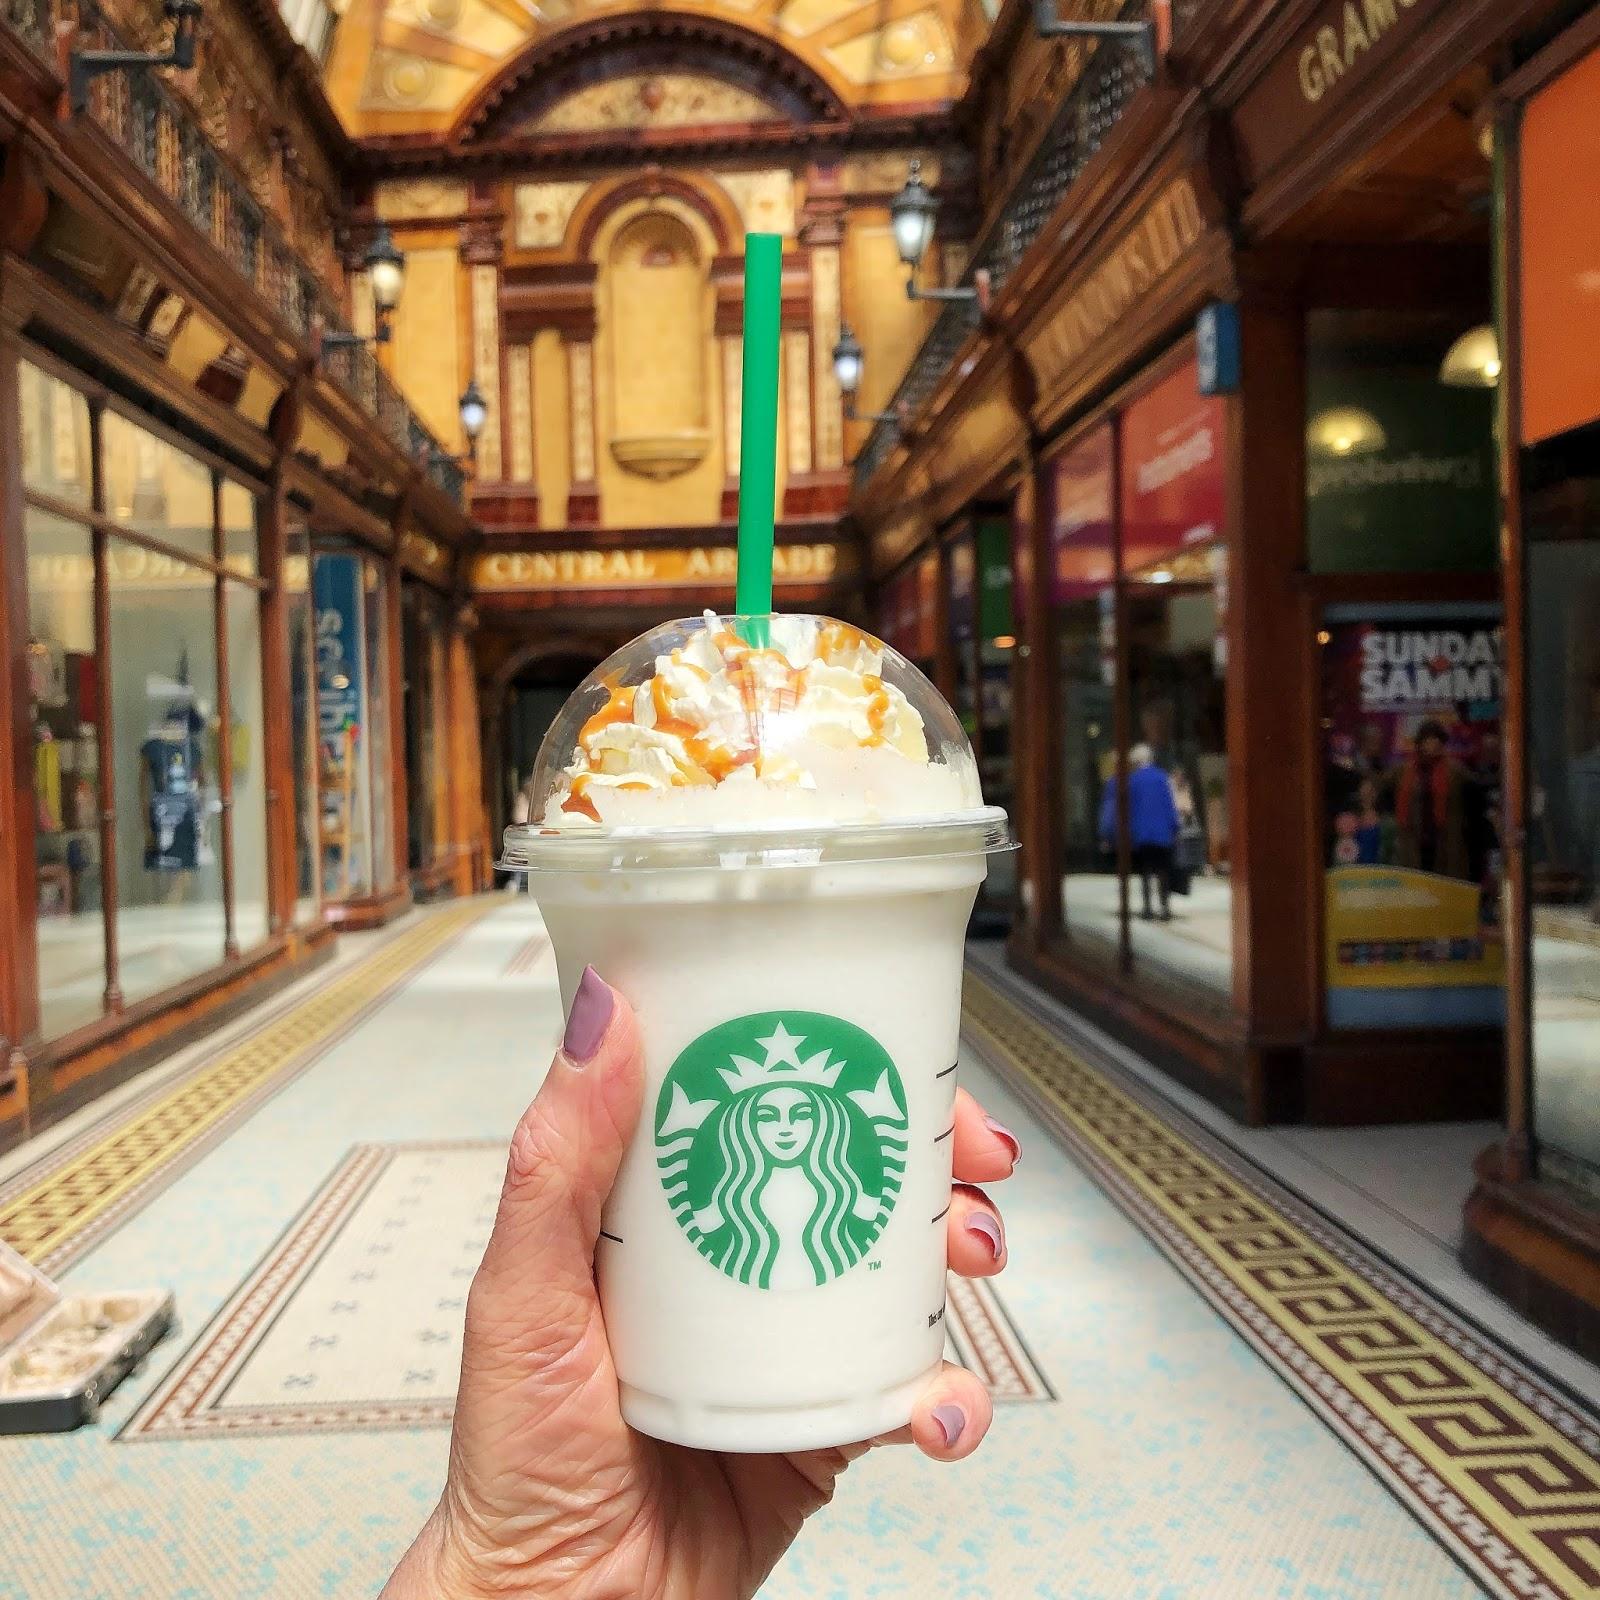 My May Days - Starbucks Frappuccino